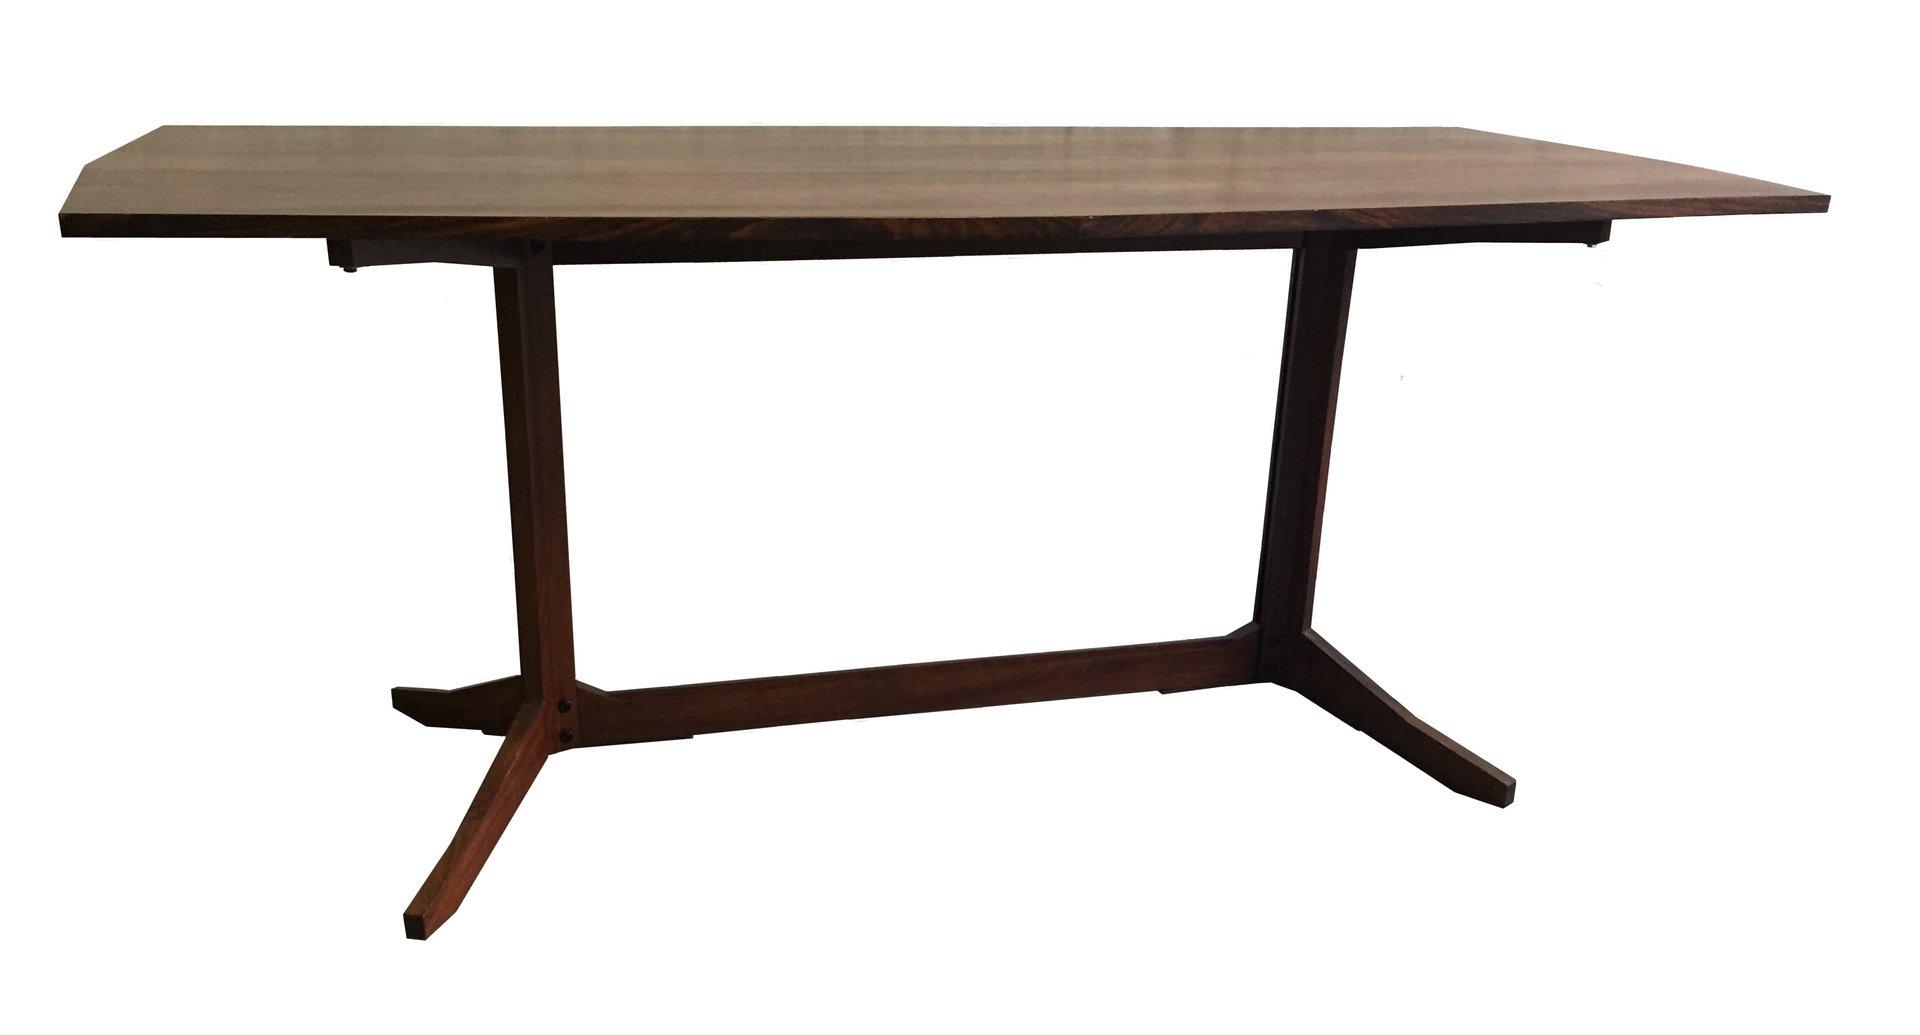 Table de salle manger en bois italie en vente sur pamono for Salle a manger en solde